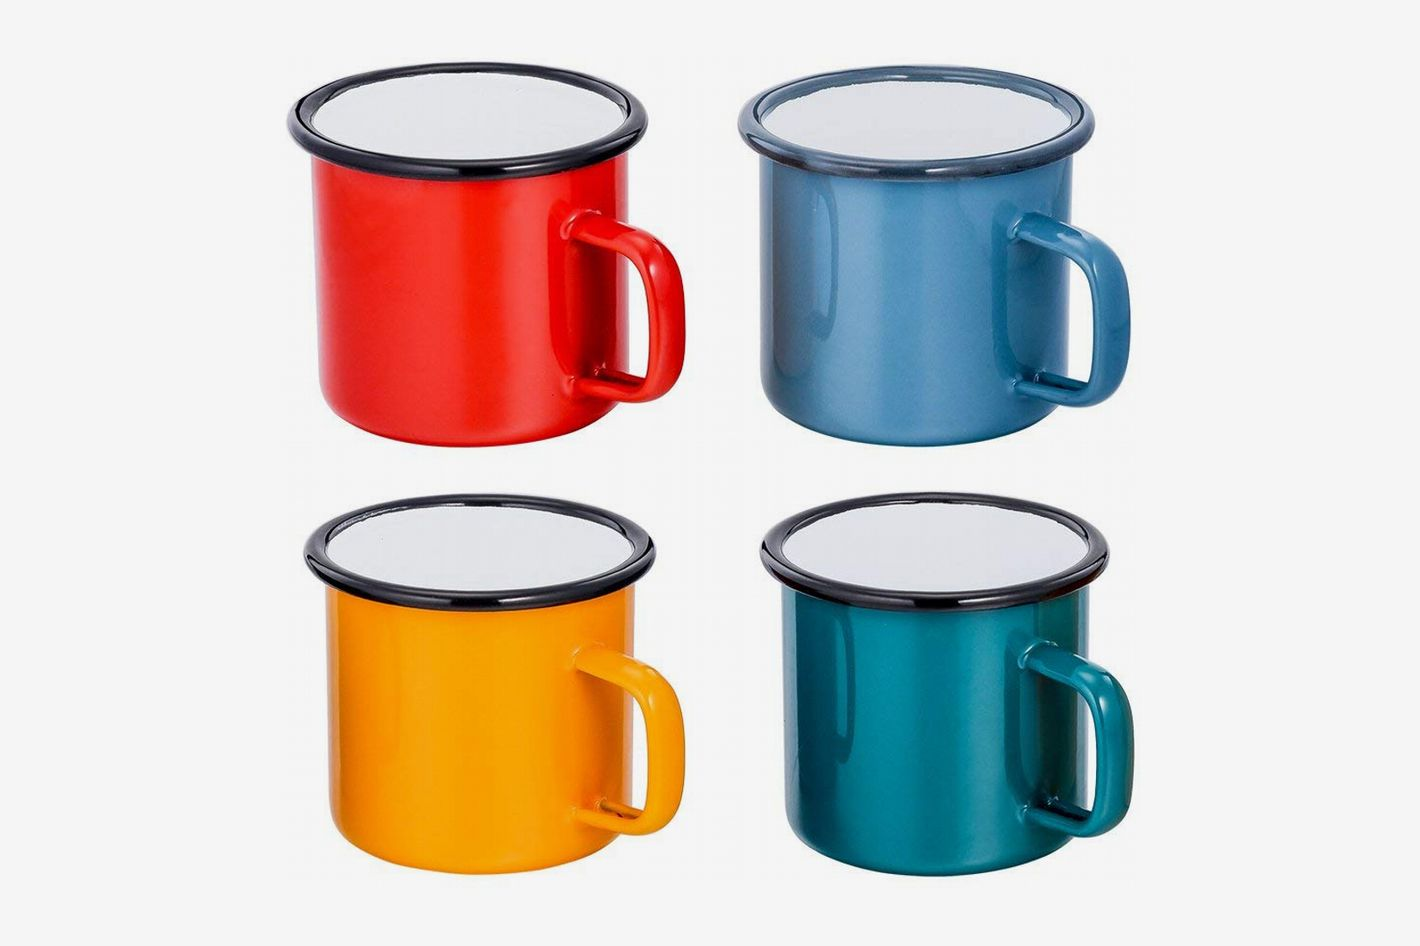 TeamFar Enamel Coffee Mug Set